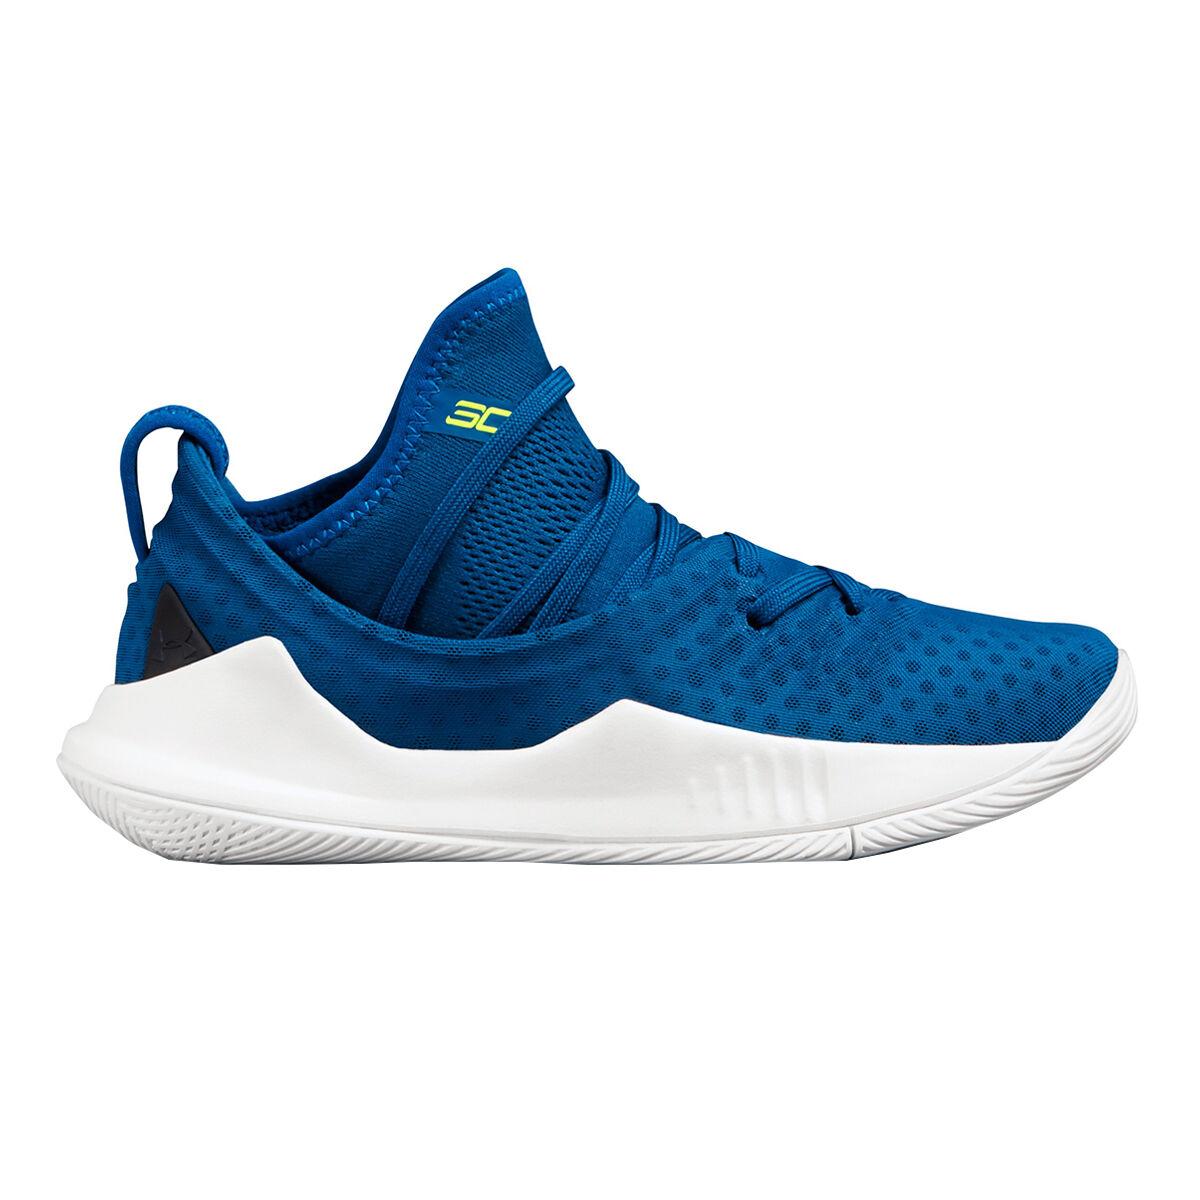 017094e21452a ... coupon for under armour curry 5 kids basketball shoes blue white us 11  d68cc e1676